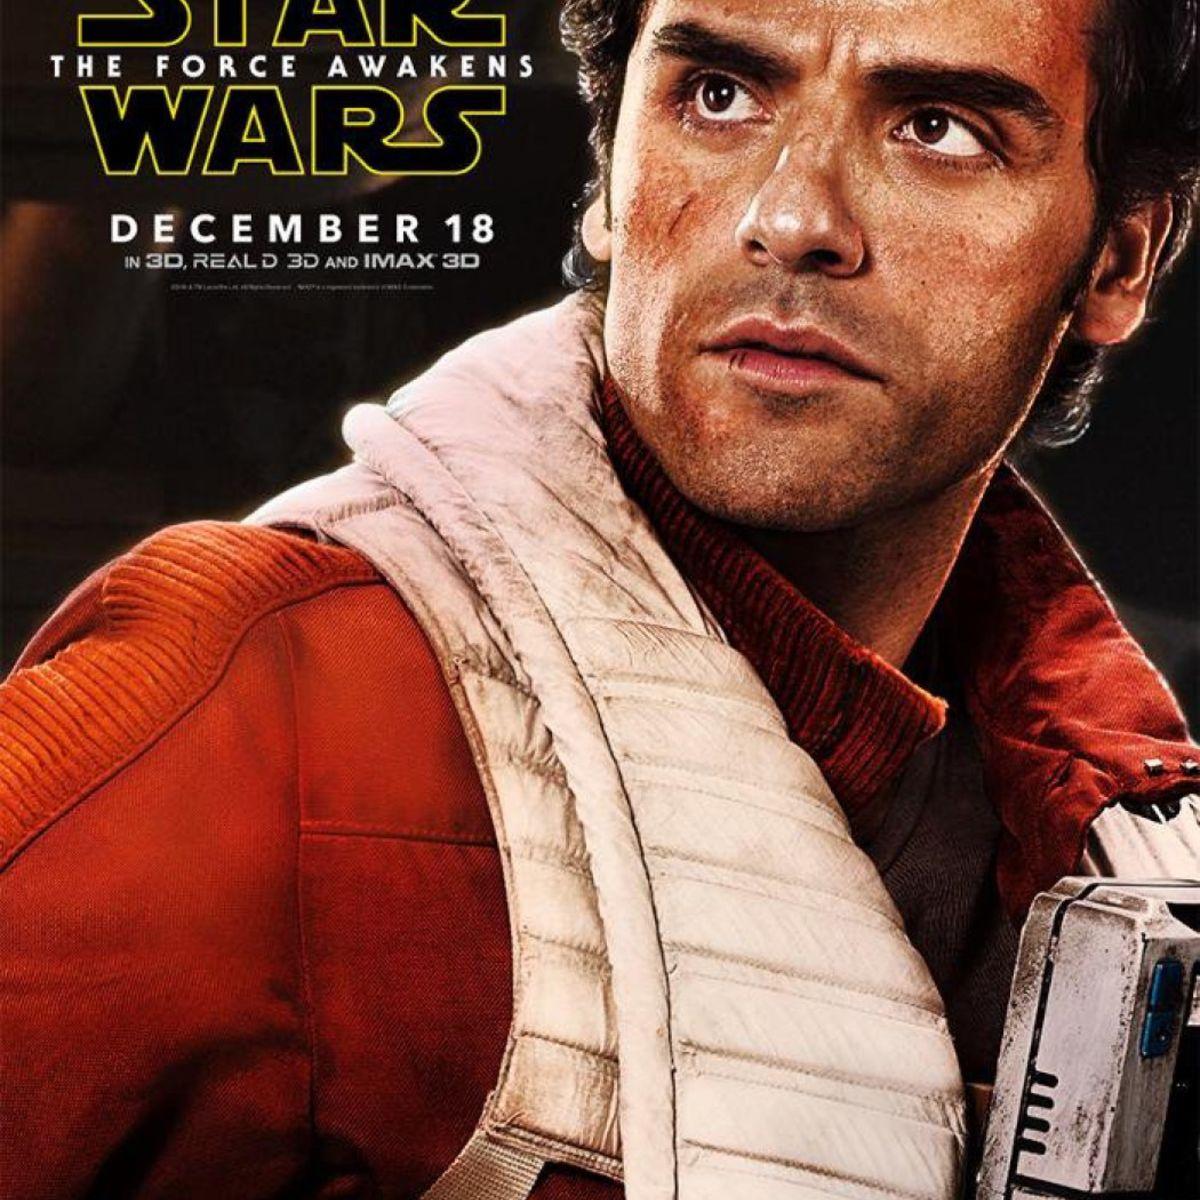 poe-dameron-star-wars-the-force-awakens-poster.jpeg